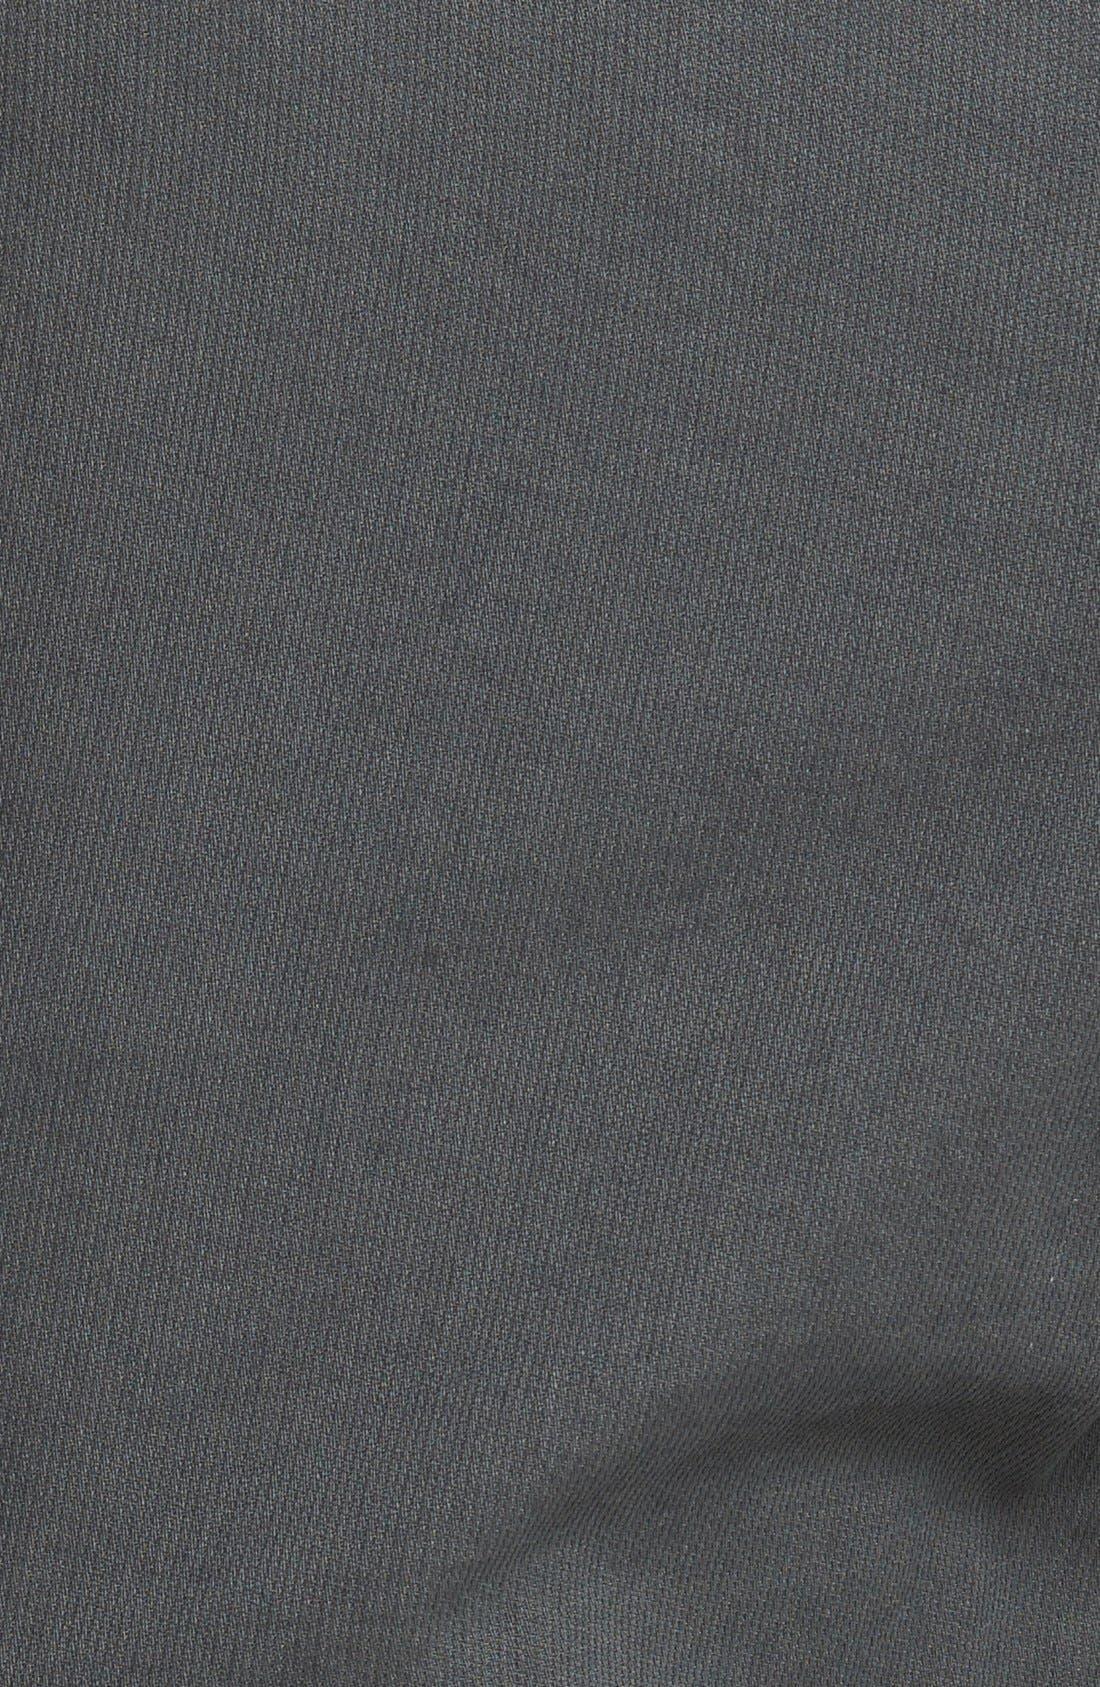 Alternate Image 3  - Original Paperbacks 'Houston' Slim Fit Cargo Shorts